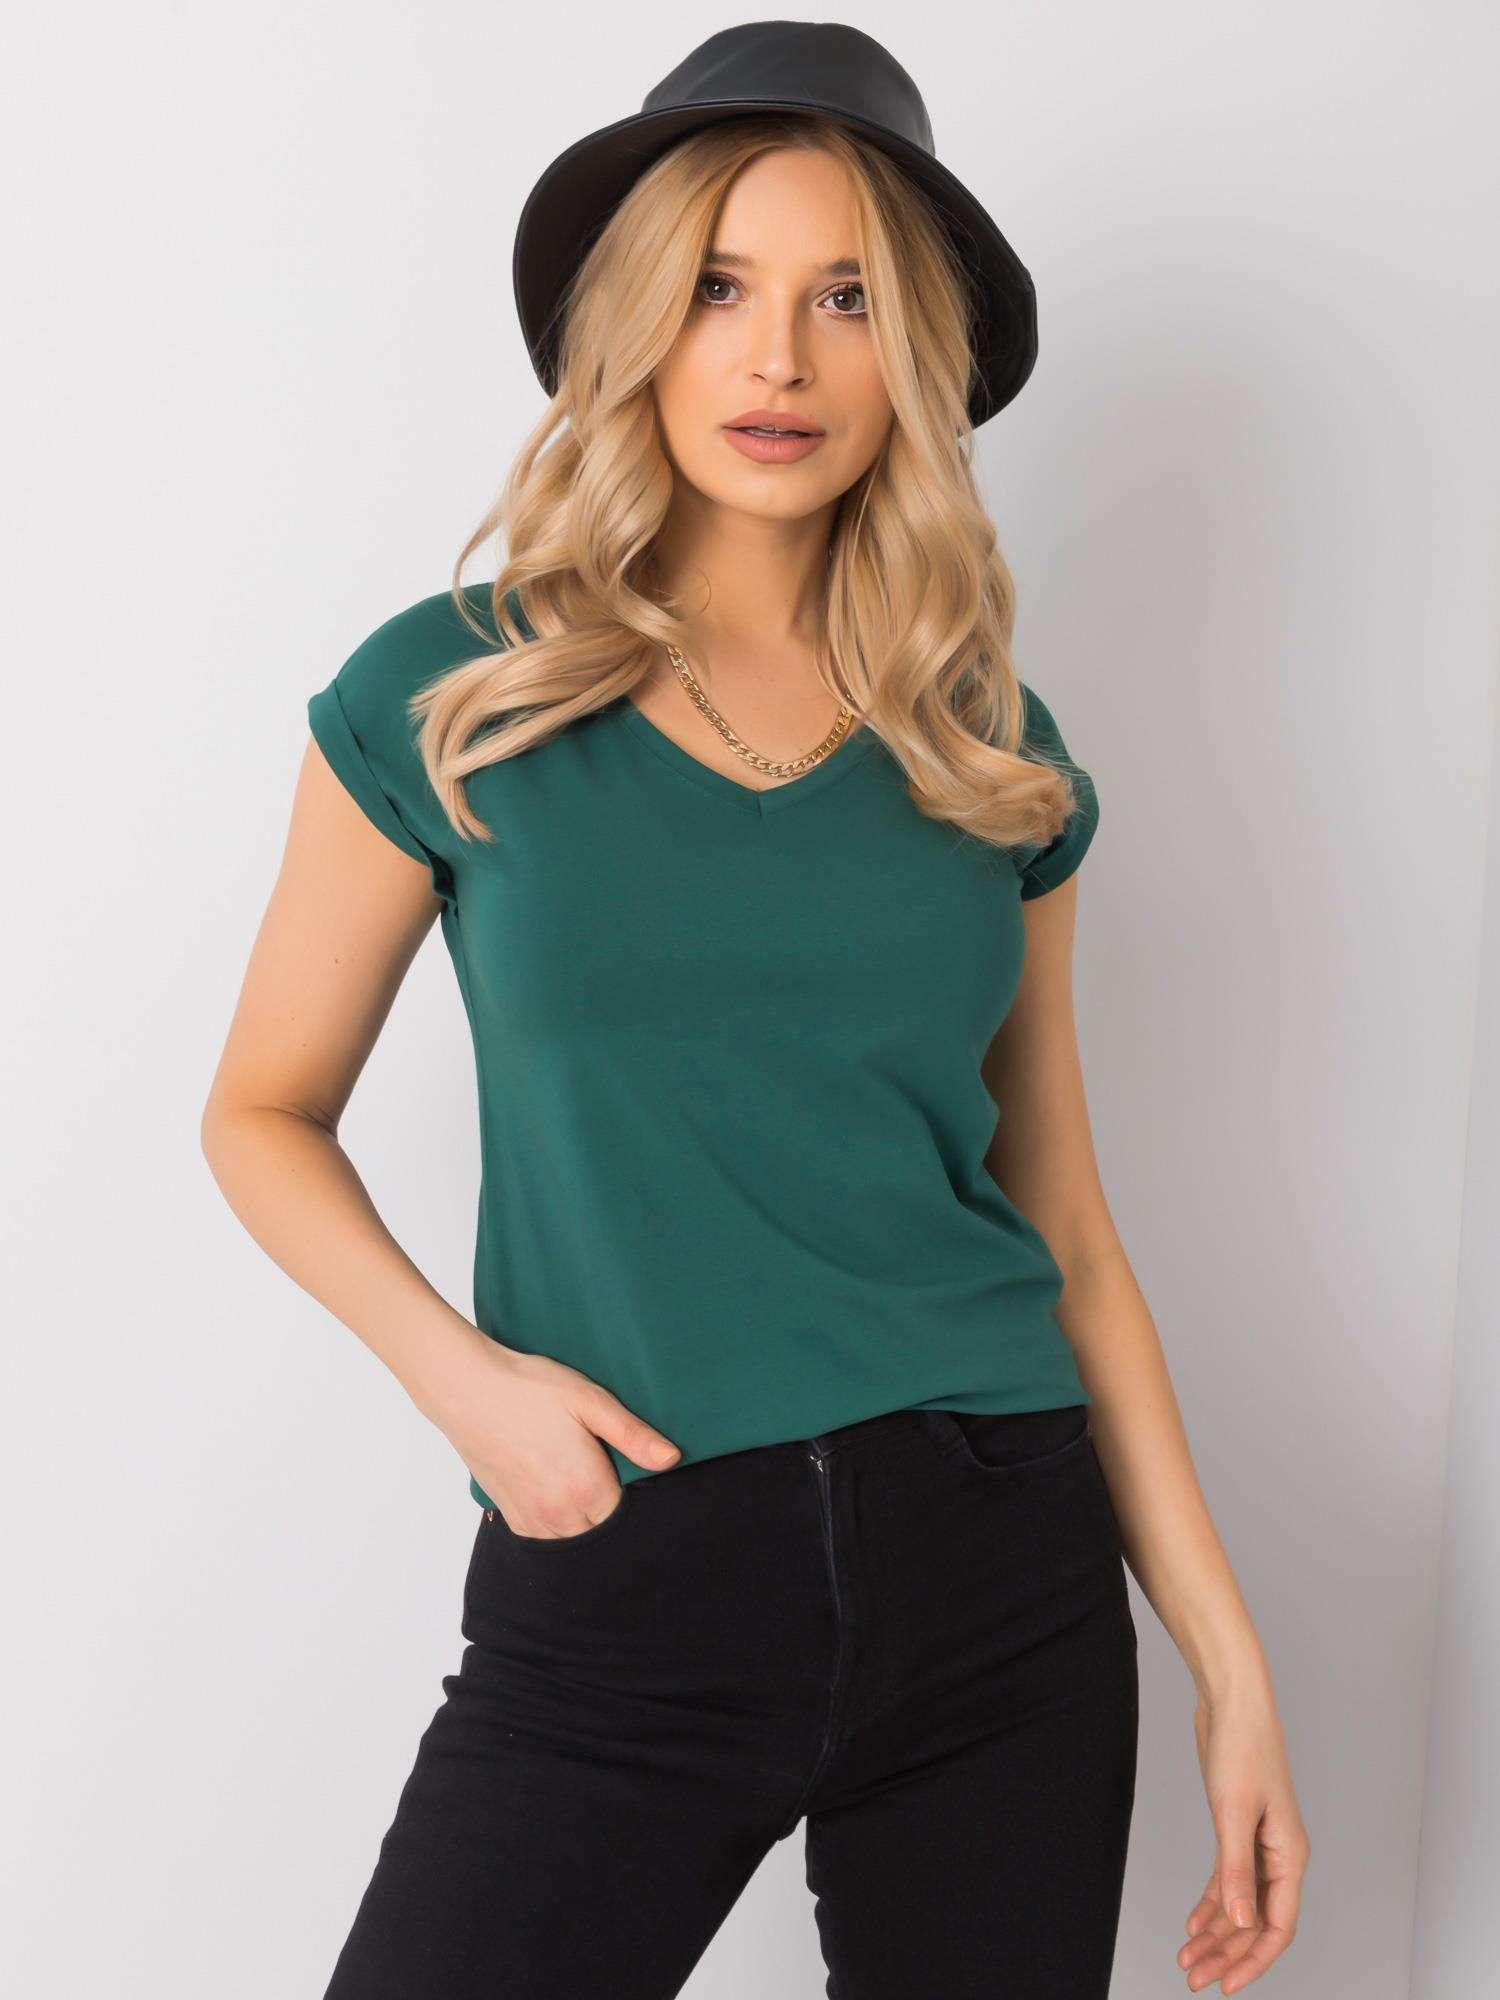 T-Shirt in Dunkelgrün mit V-Ausschnitt Komplettansicht